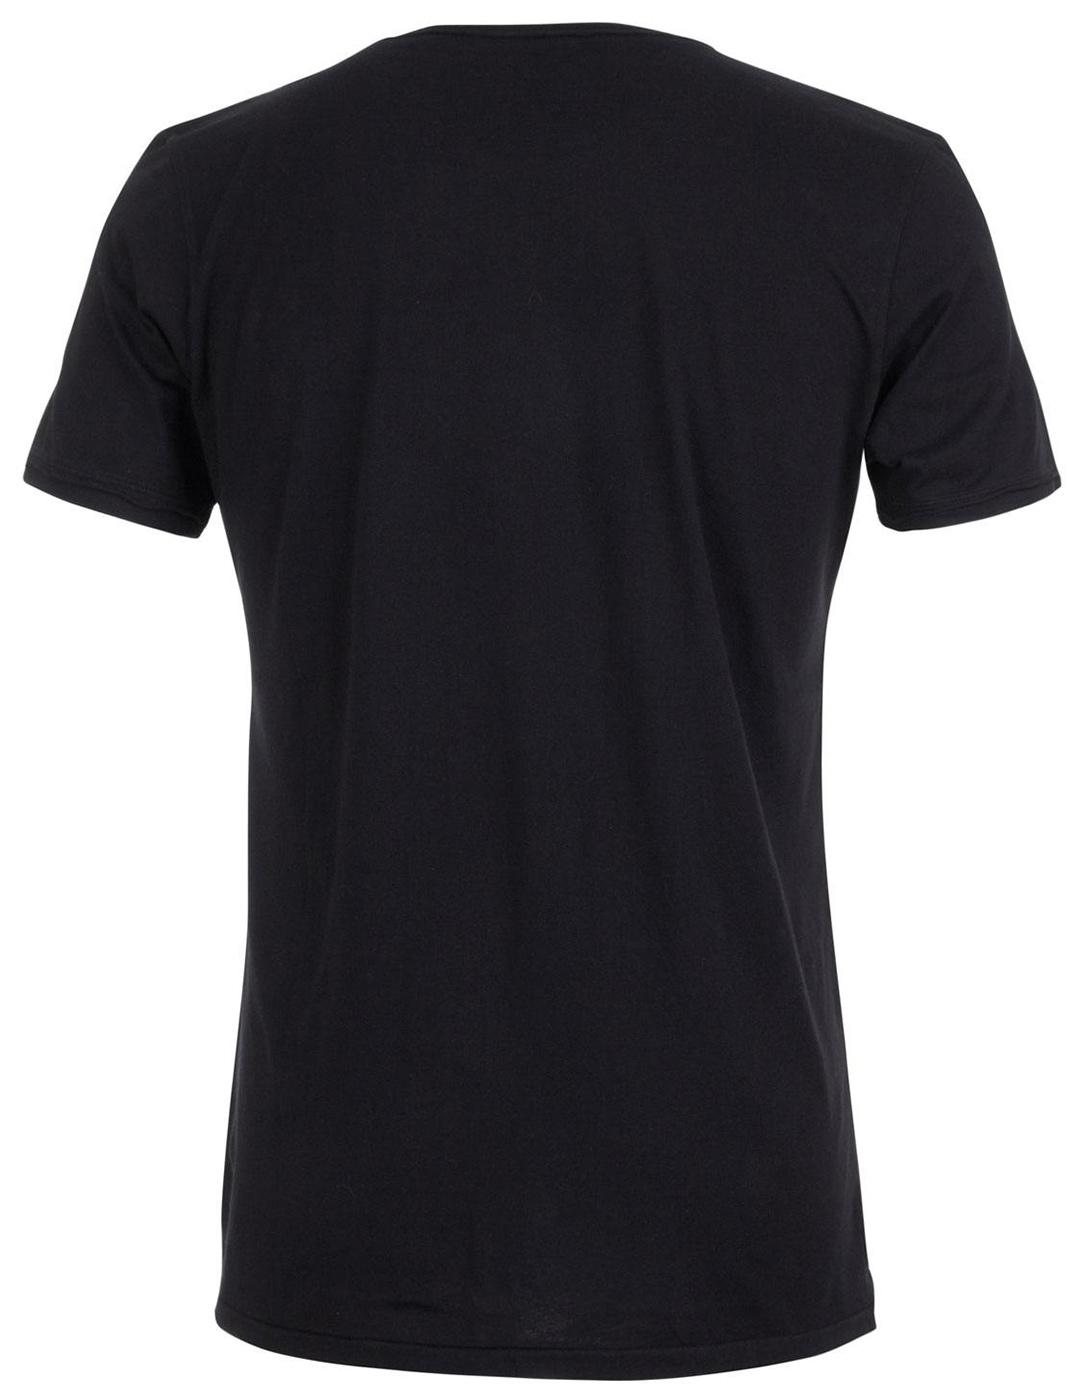 "Lounge Travel Shirt ""Tao"" - charcoal"